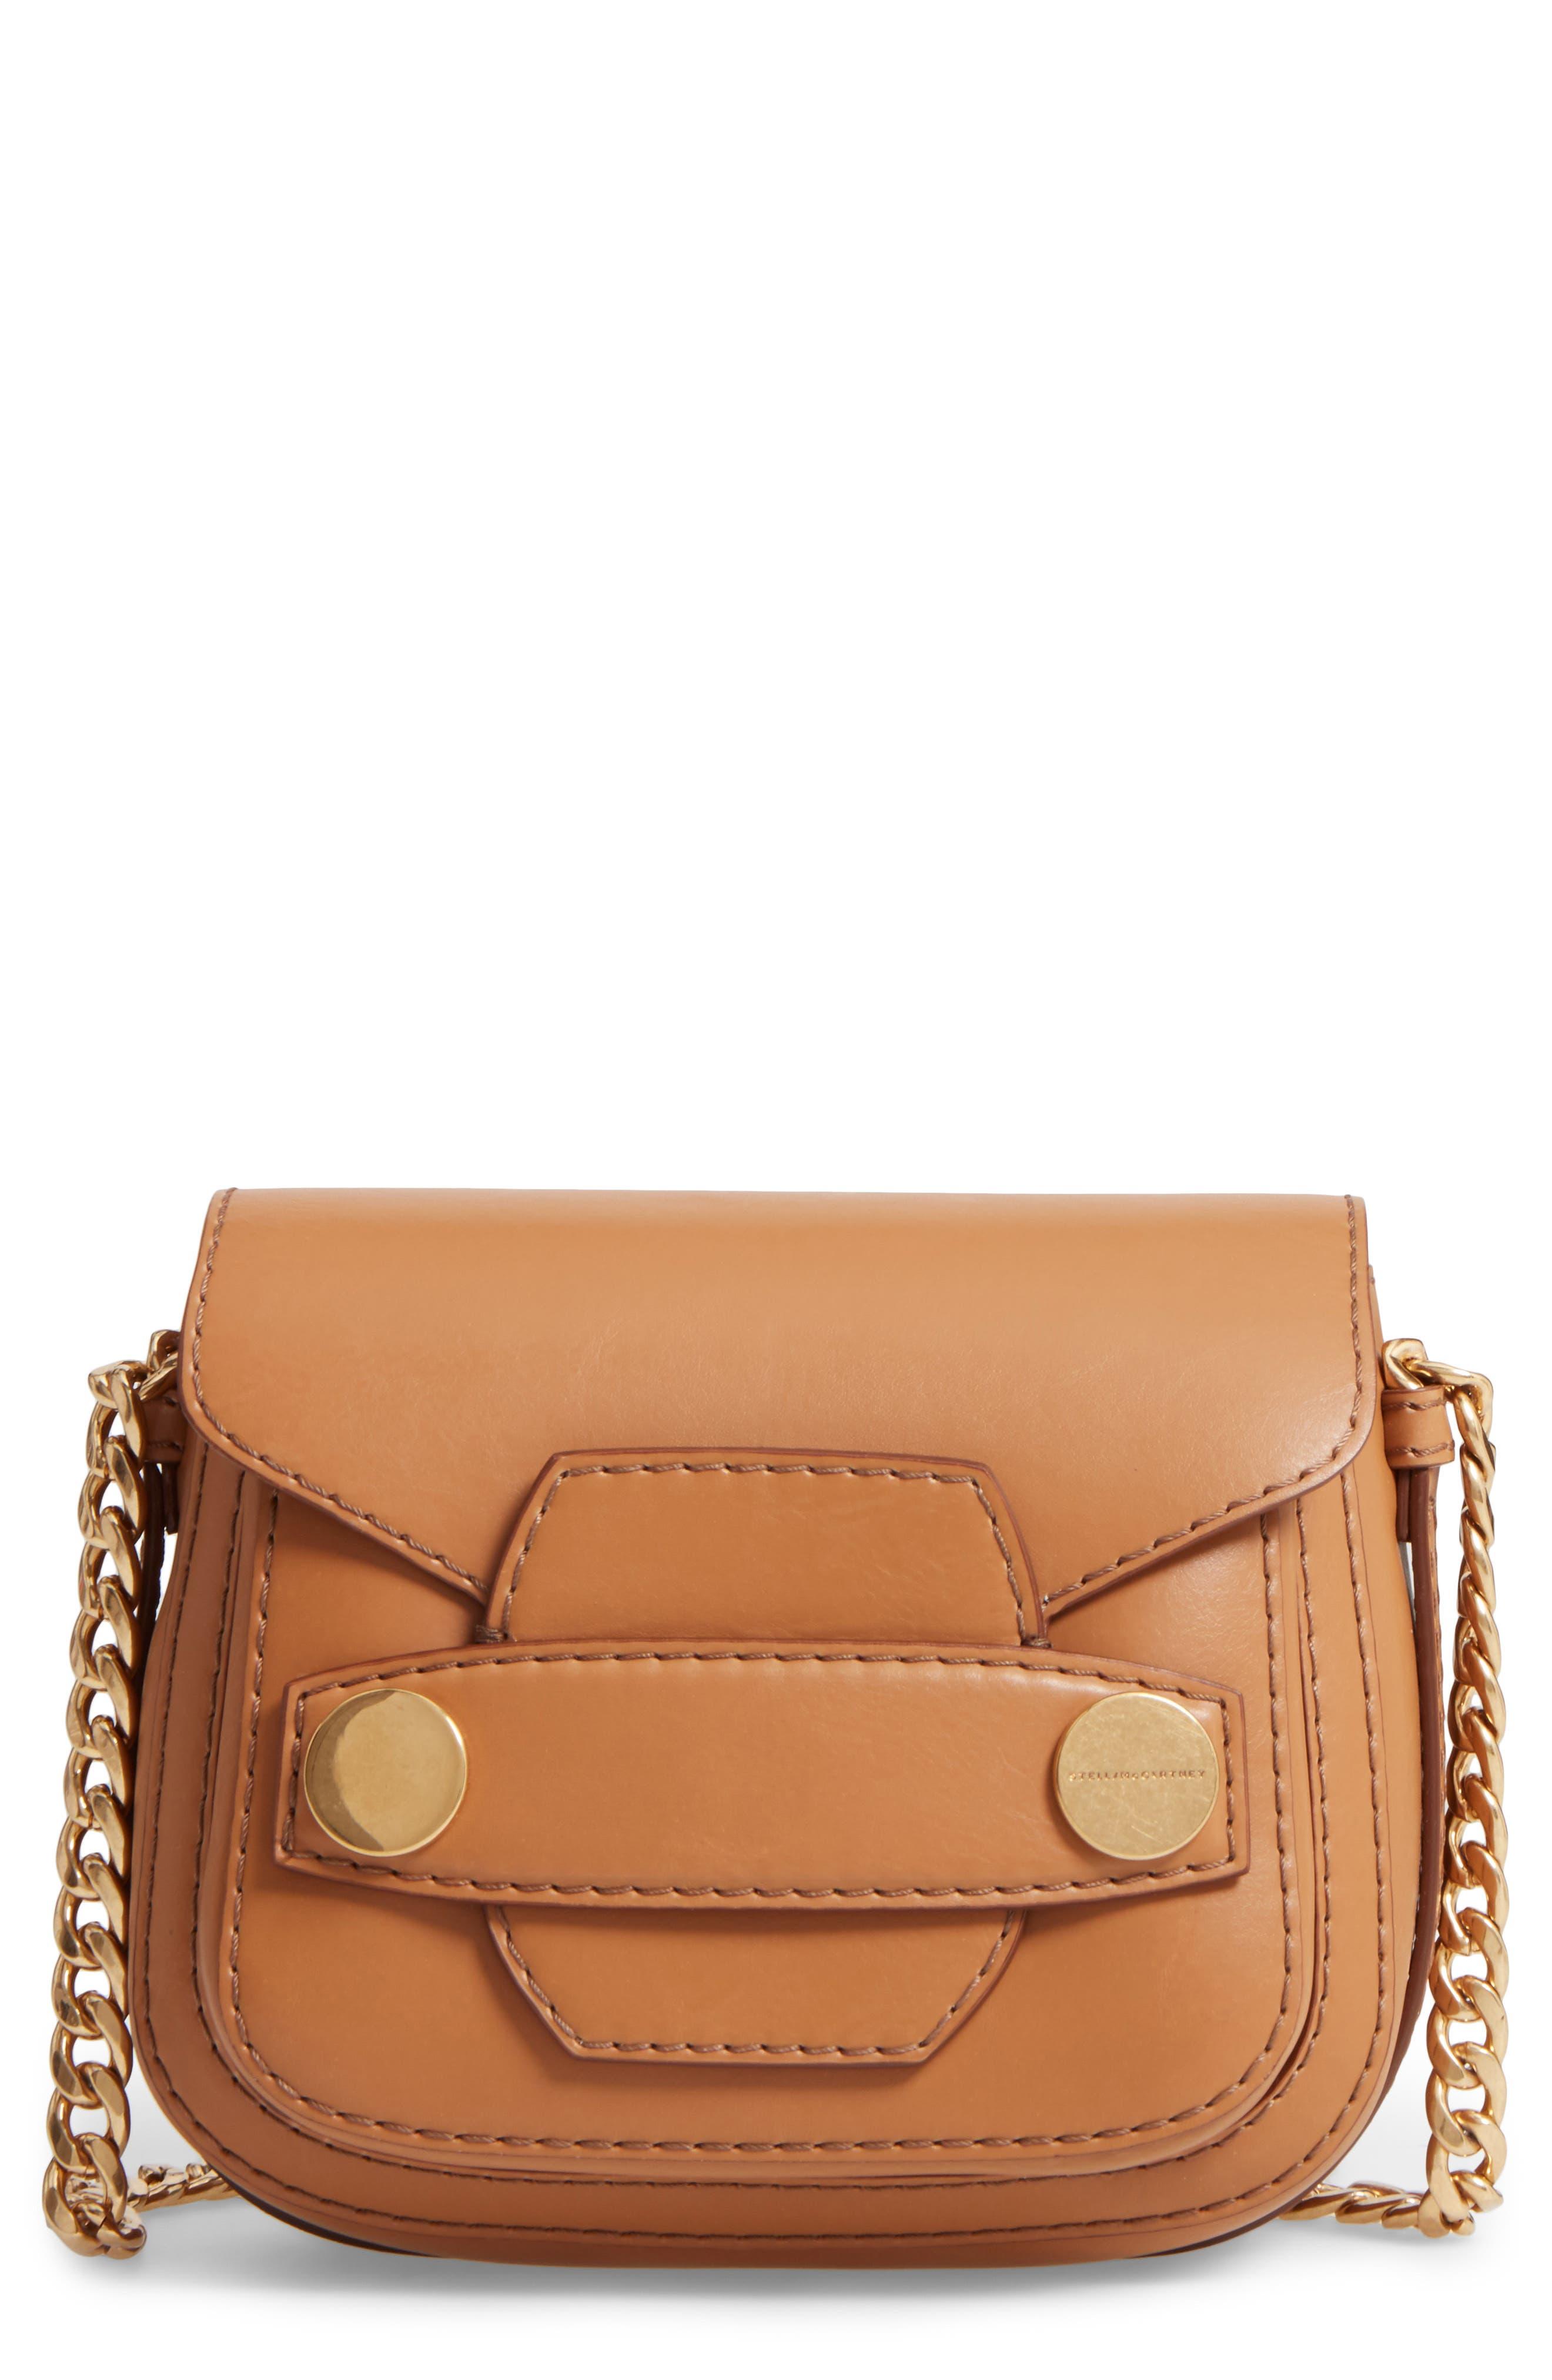 STELLA MCCARTNEY Textured Faux Leather Crossbody Bag